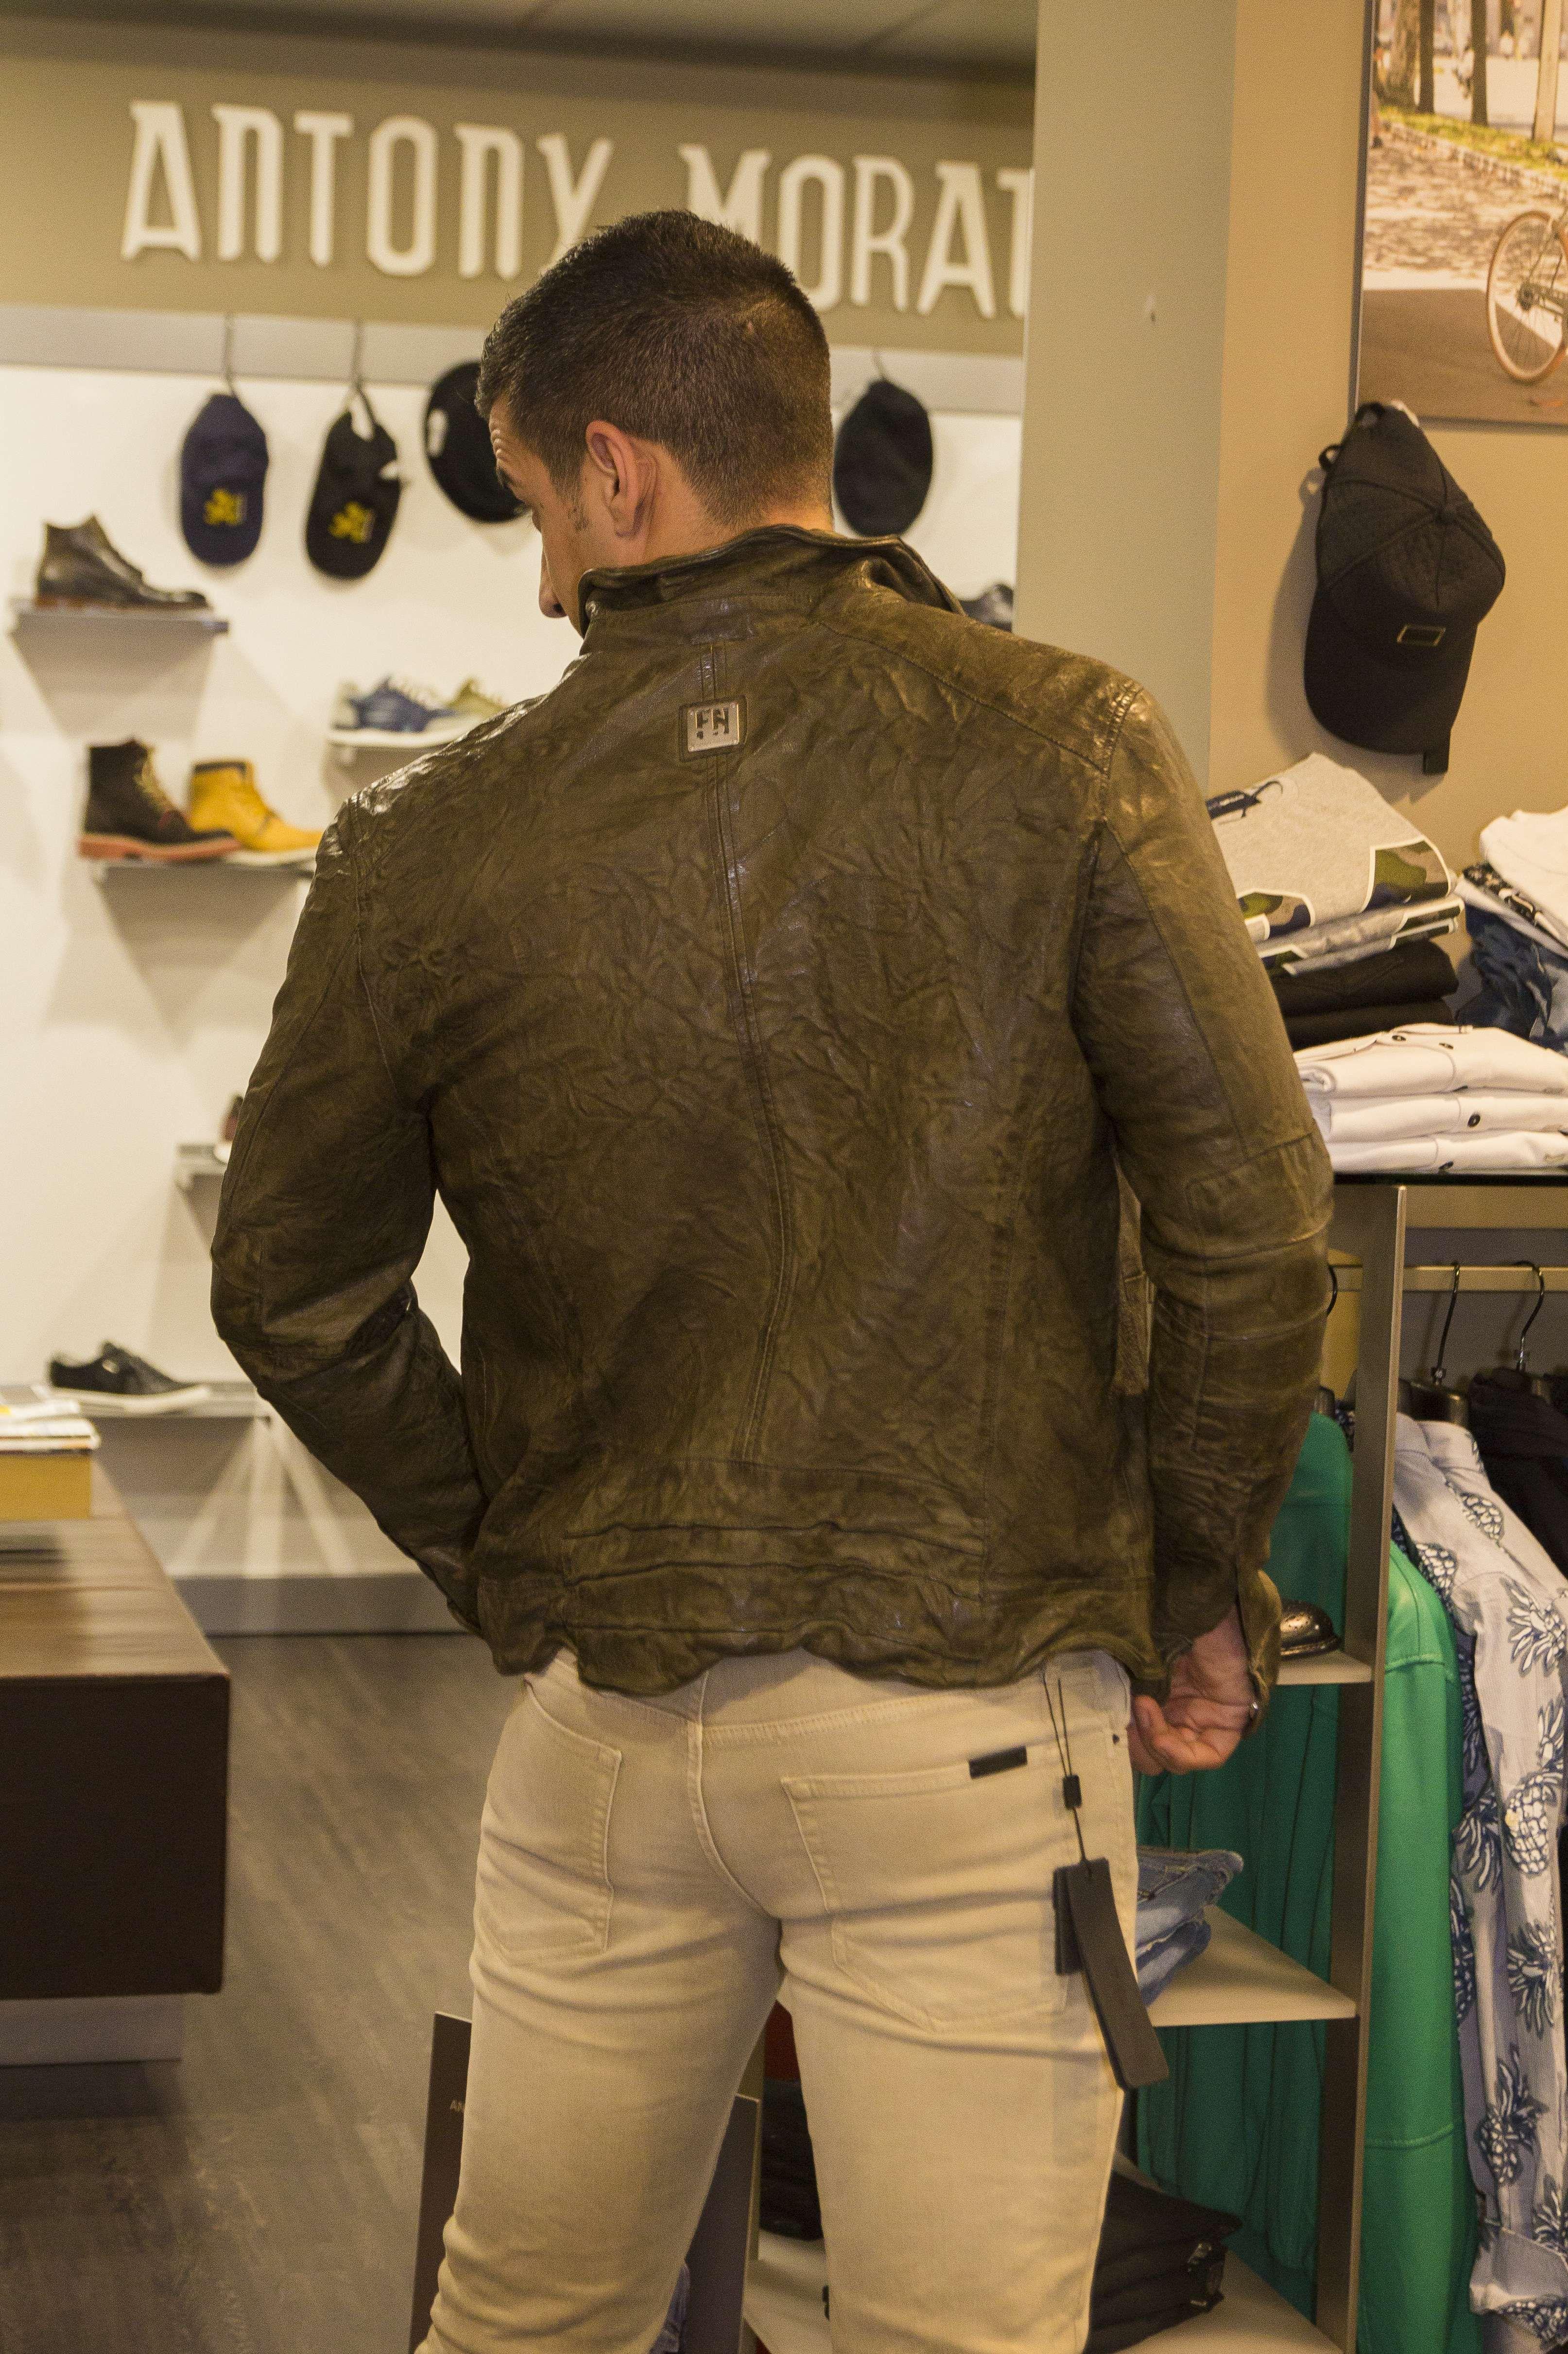 Antony Morato moda de caballero